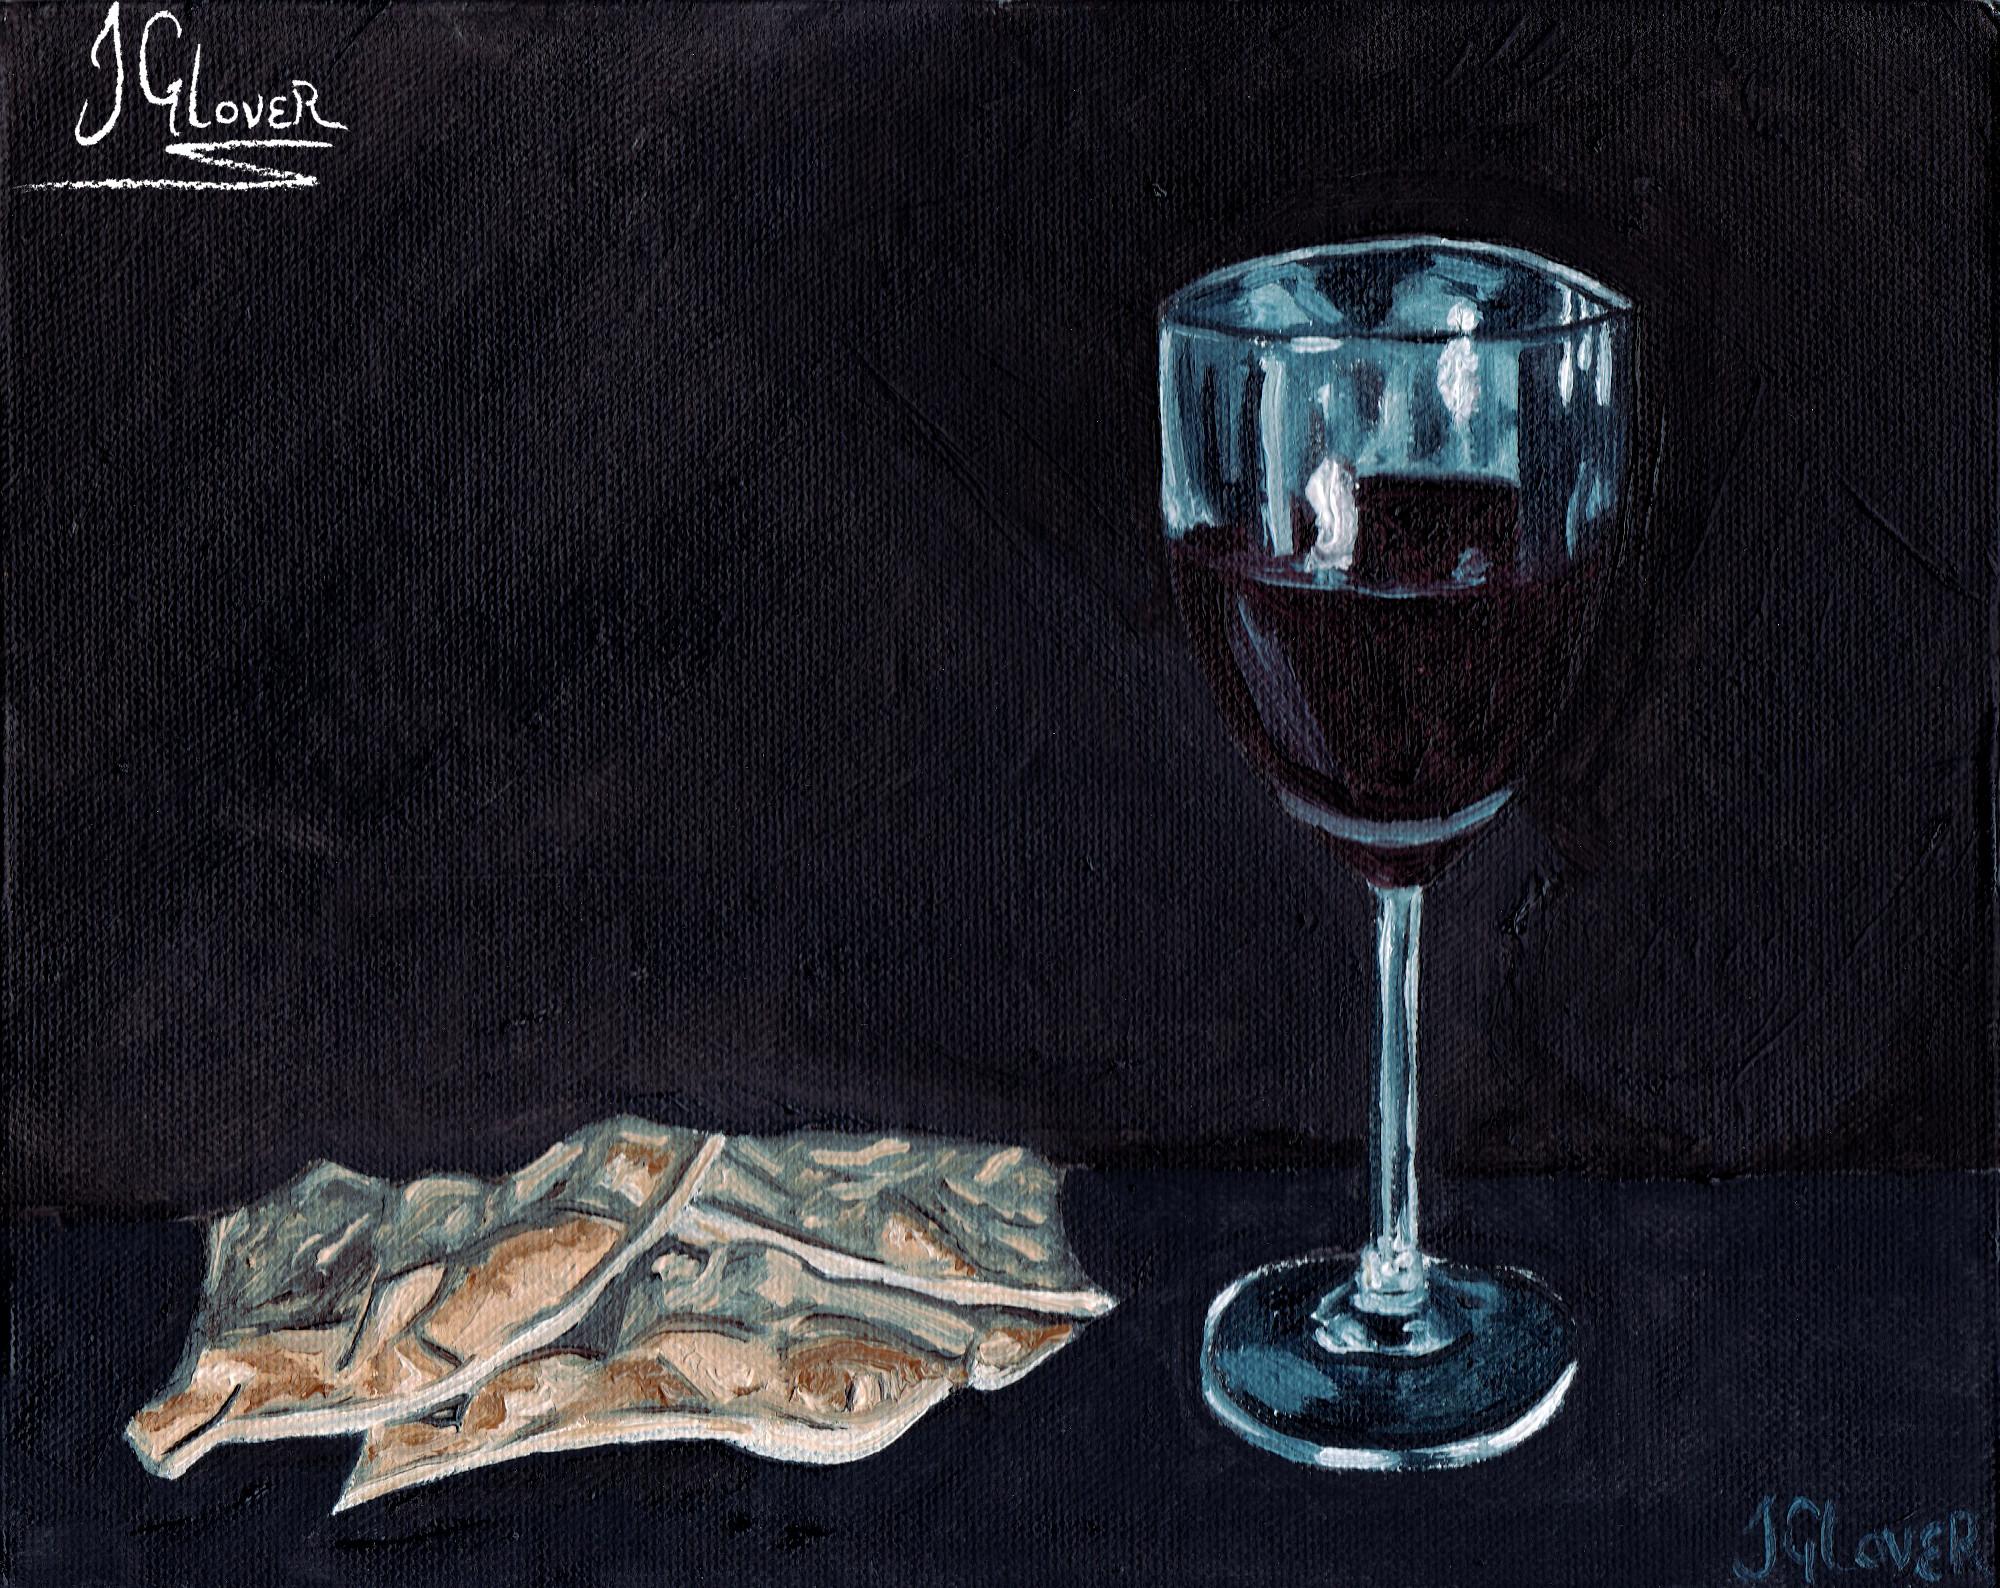 Christian - art - illustration - religious - painting - oil - alla prima - still life - wine - bread - memorial - glass